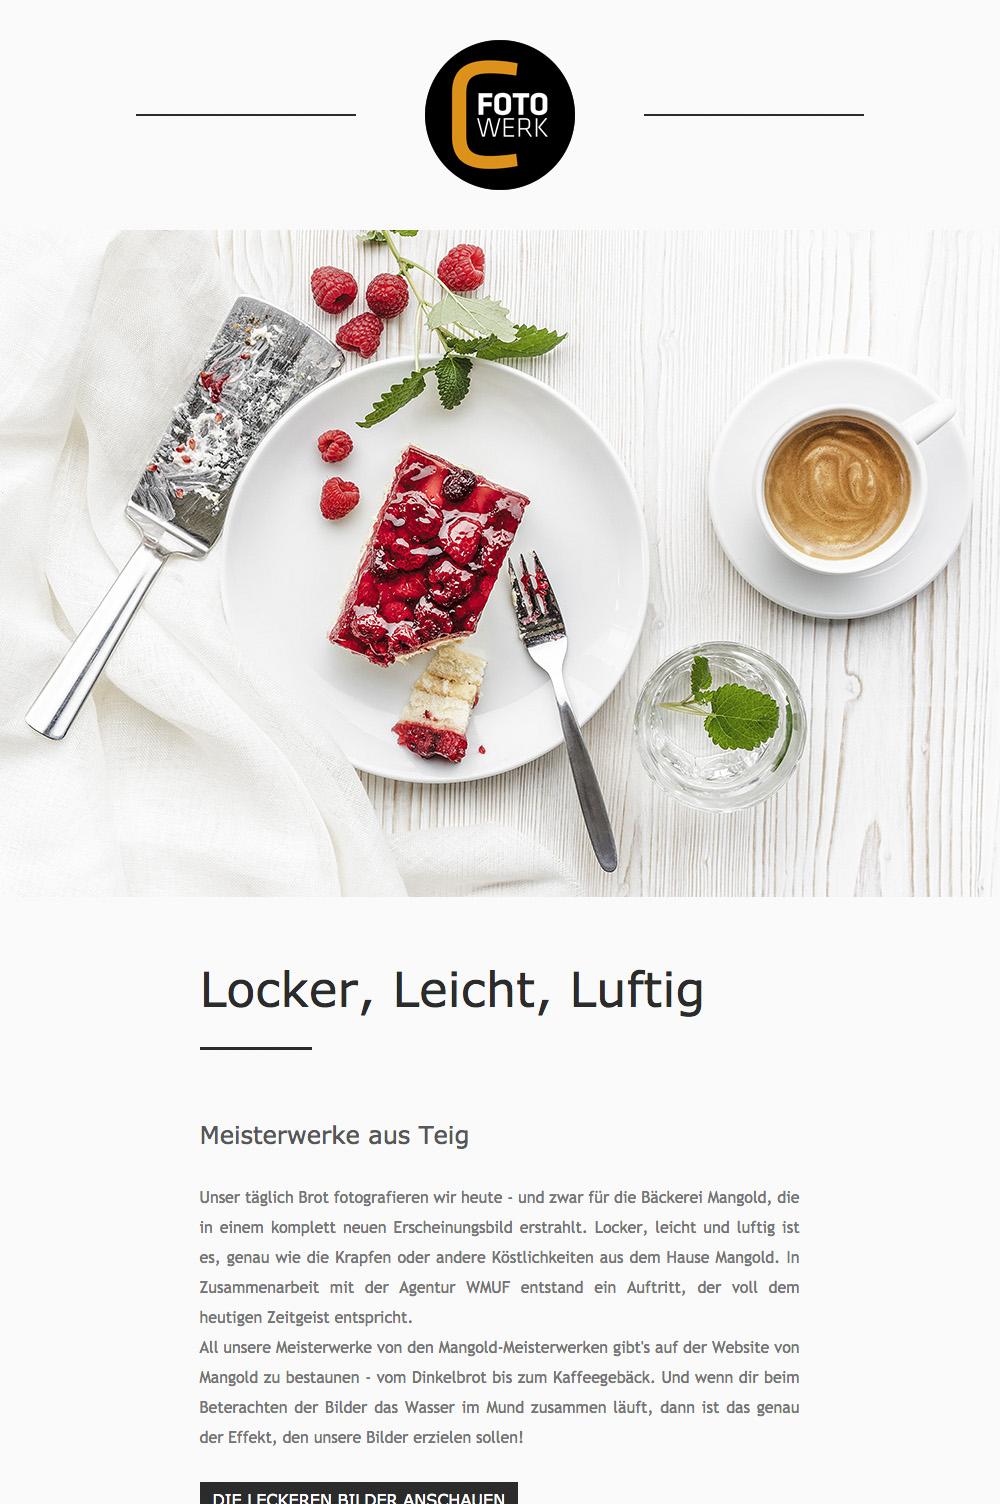 Fotowerk Newsletter 2019-02 - Foodfotografie, Modefotografie, Kunstfotografie